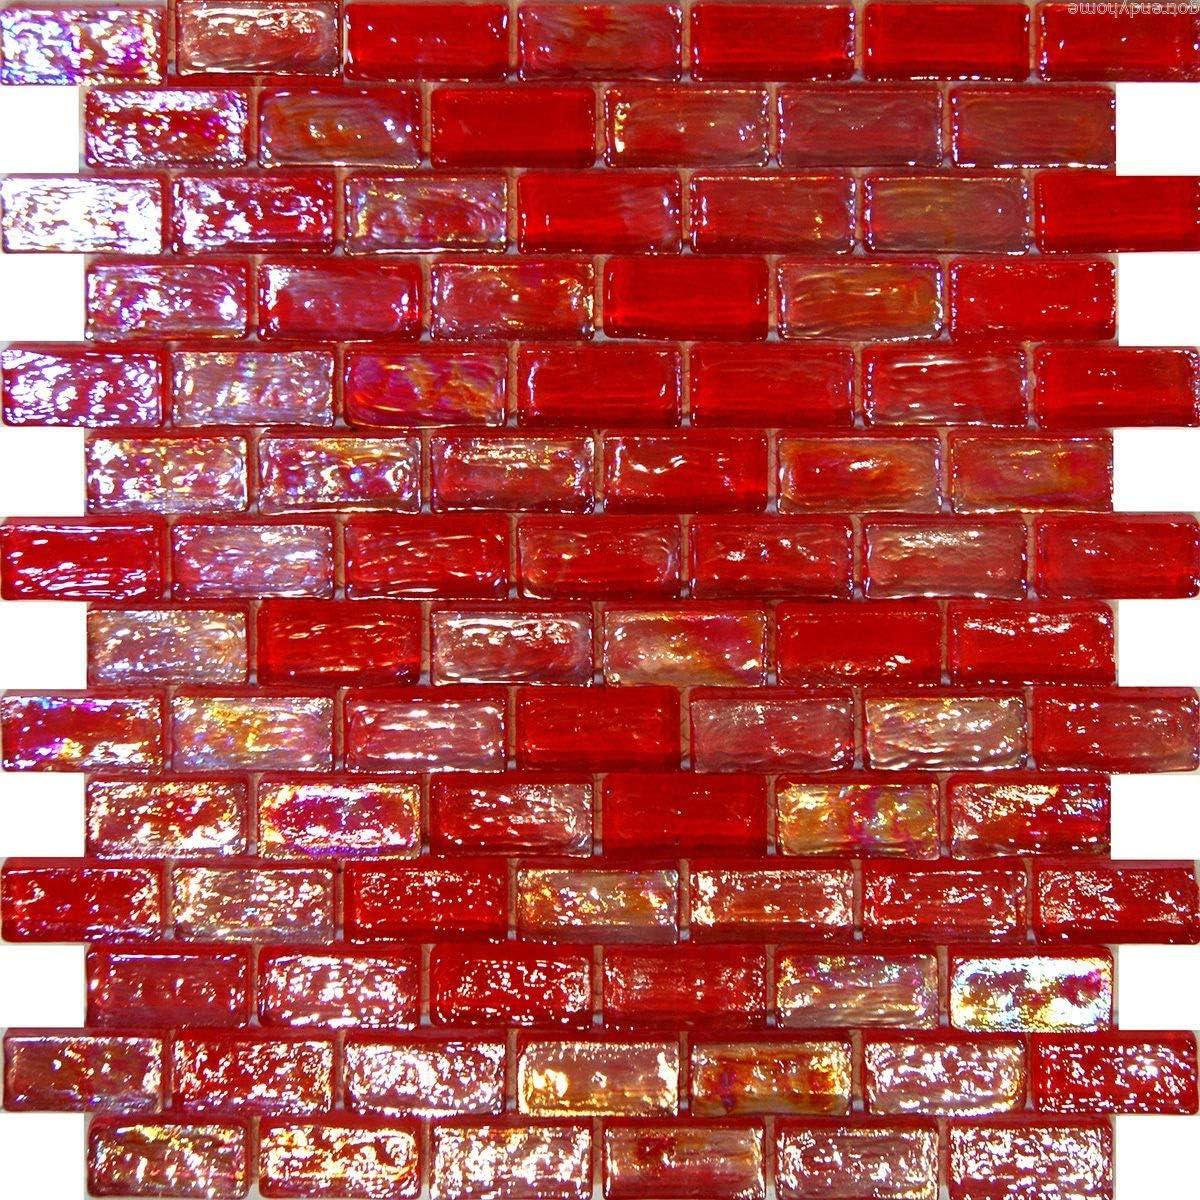 - Amazon.com: Thaisan7, 10SF-Red Iridescent Subway Glass Mosaic Tile